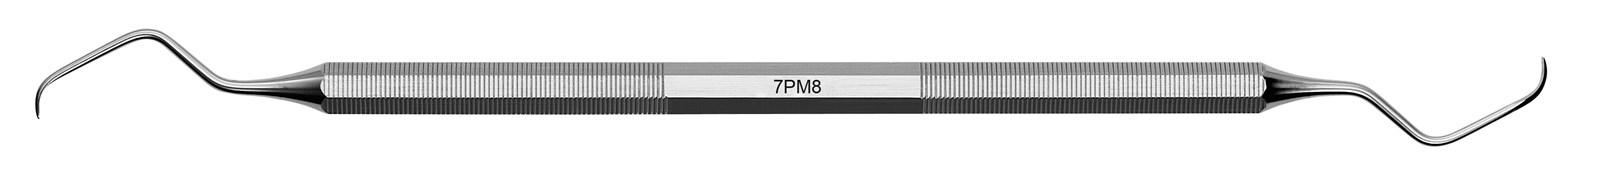 Kyreta Gracey Mini - 7PM8, ADEP fialový